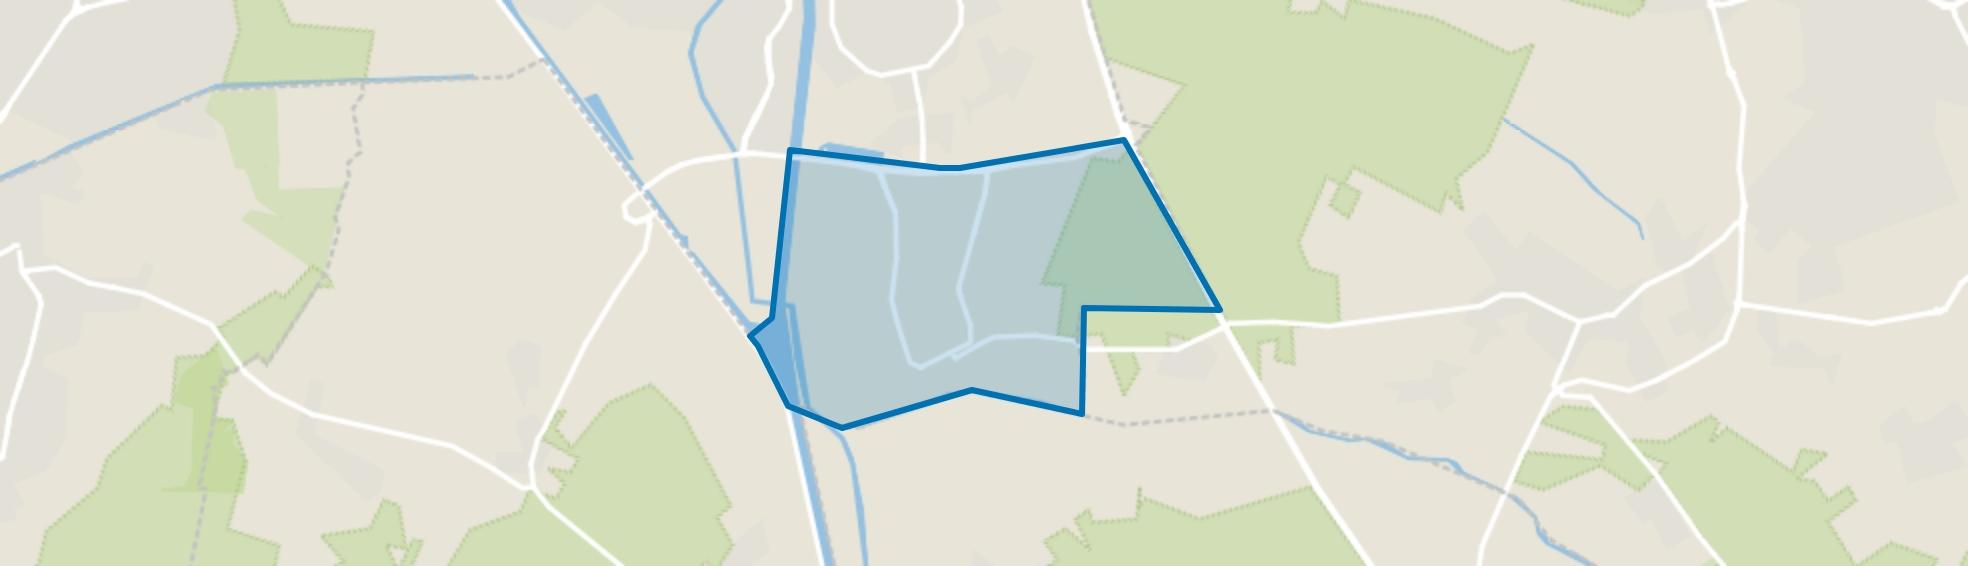 B.Z.O.B., Helmond map